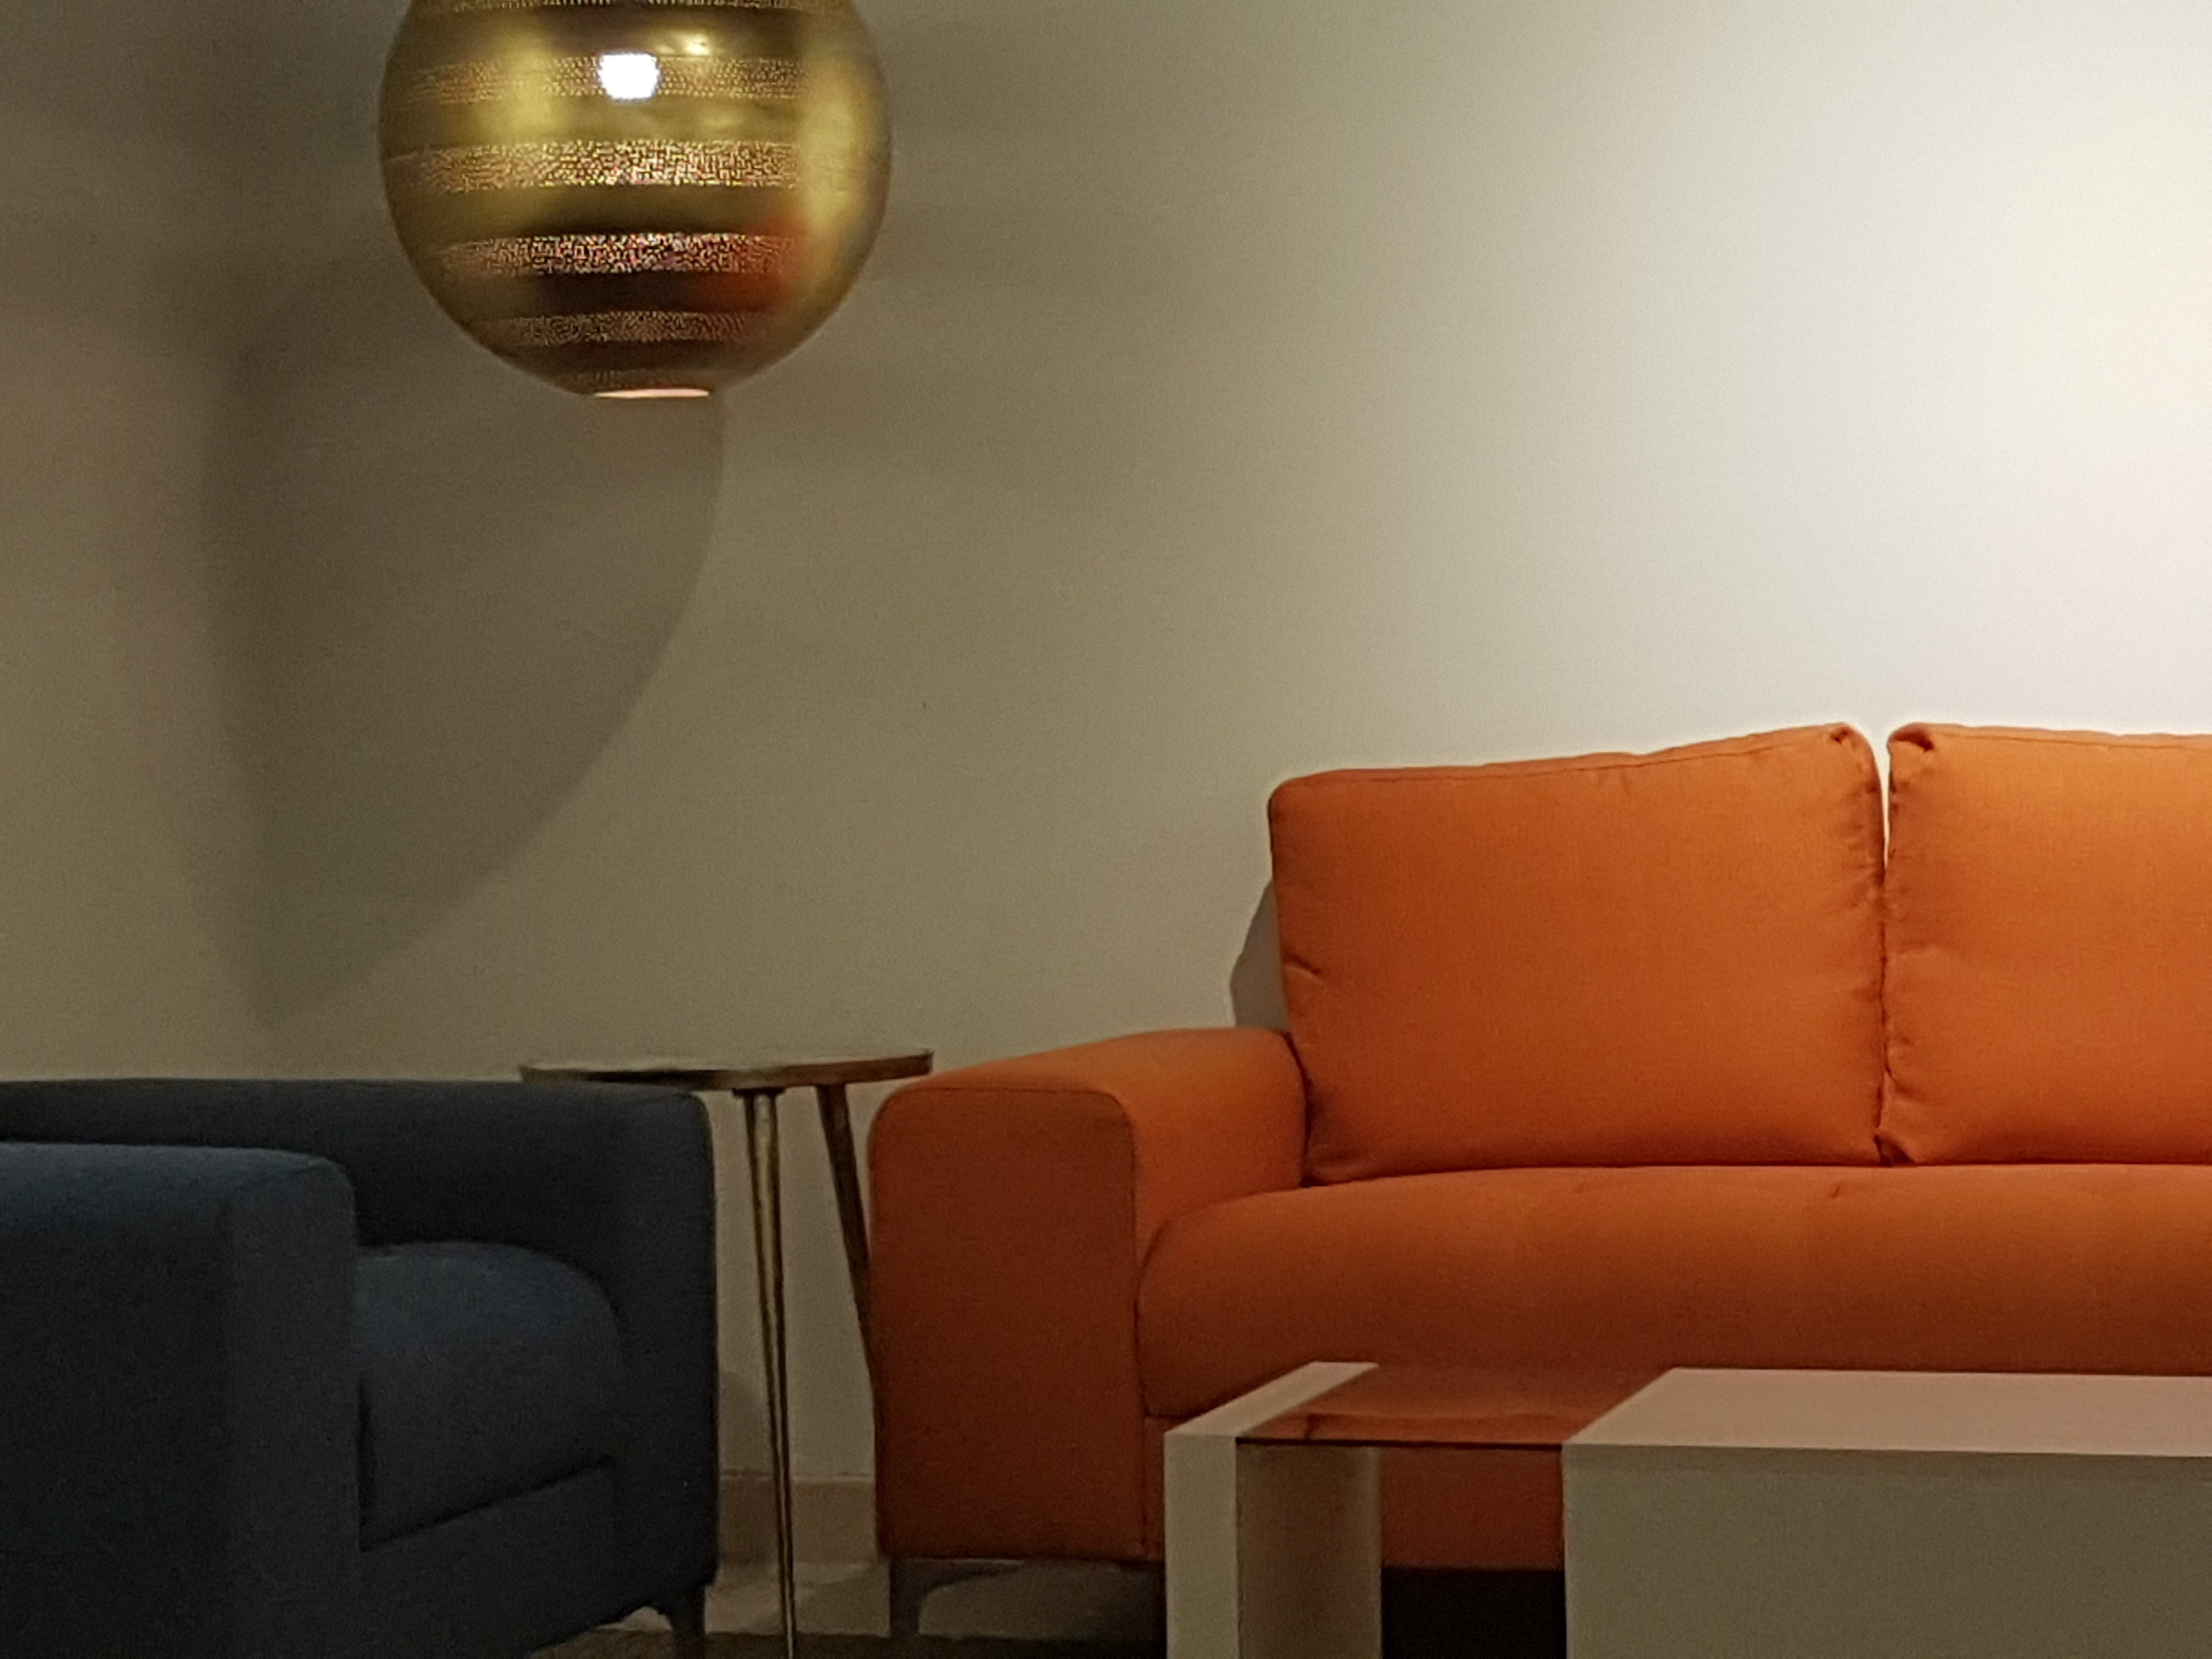 Free stock photo of furniture, home interior